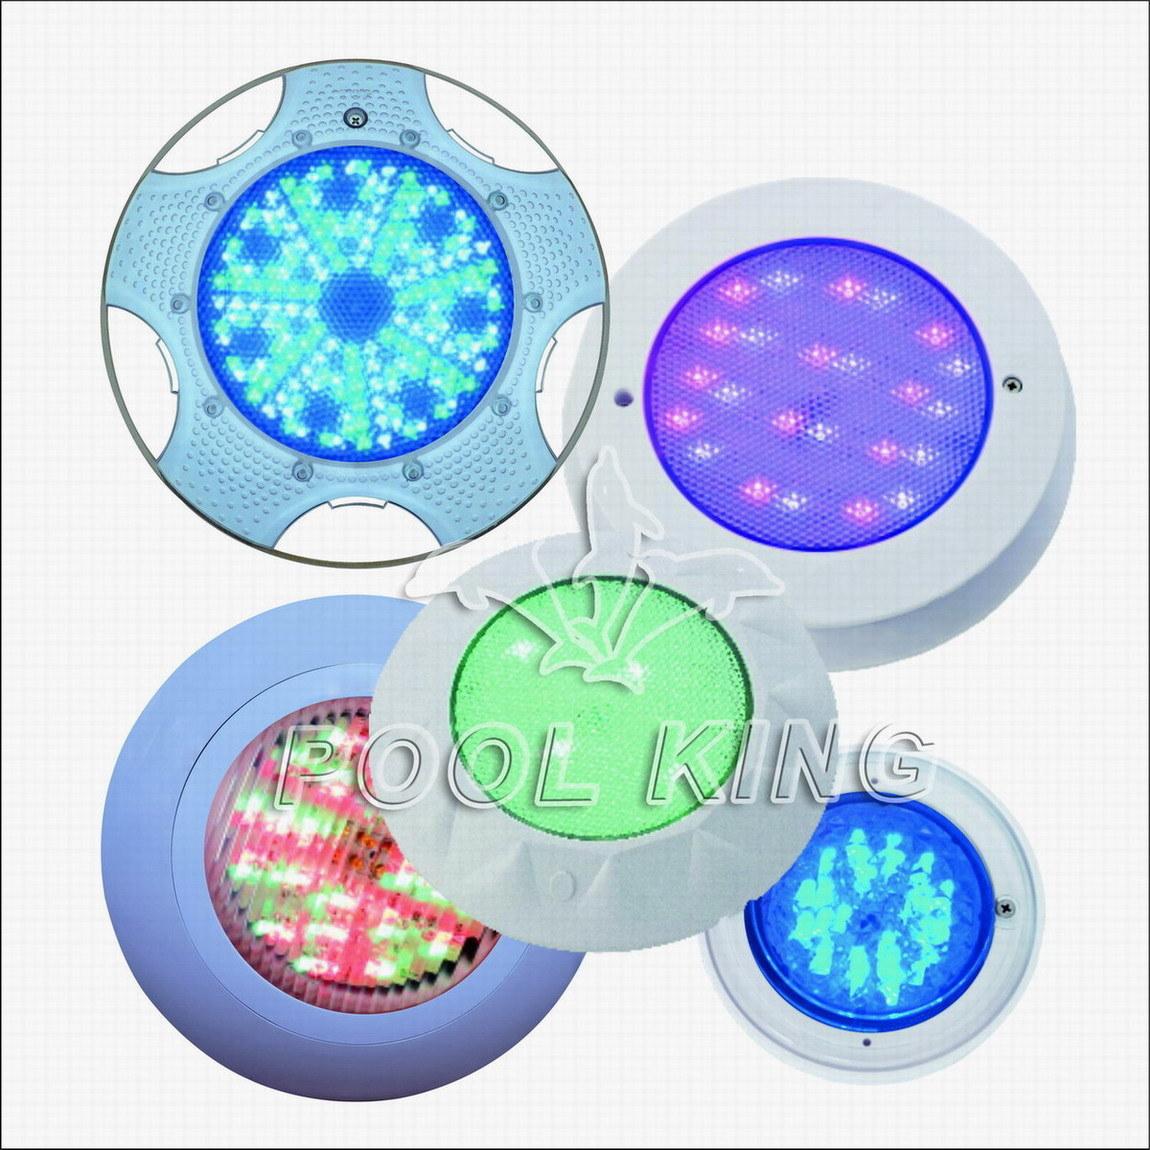 LED Underwater Lights for Swimming Pool